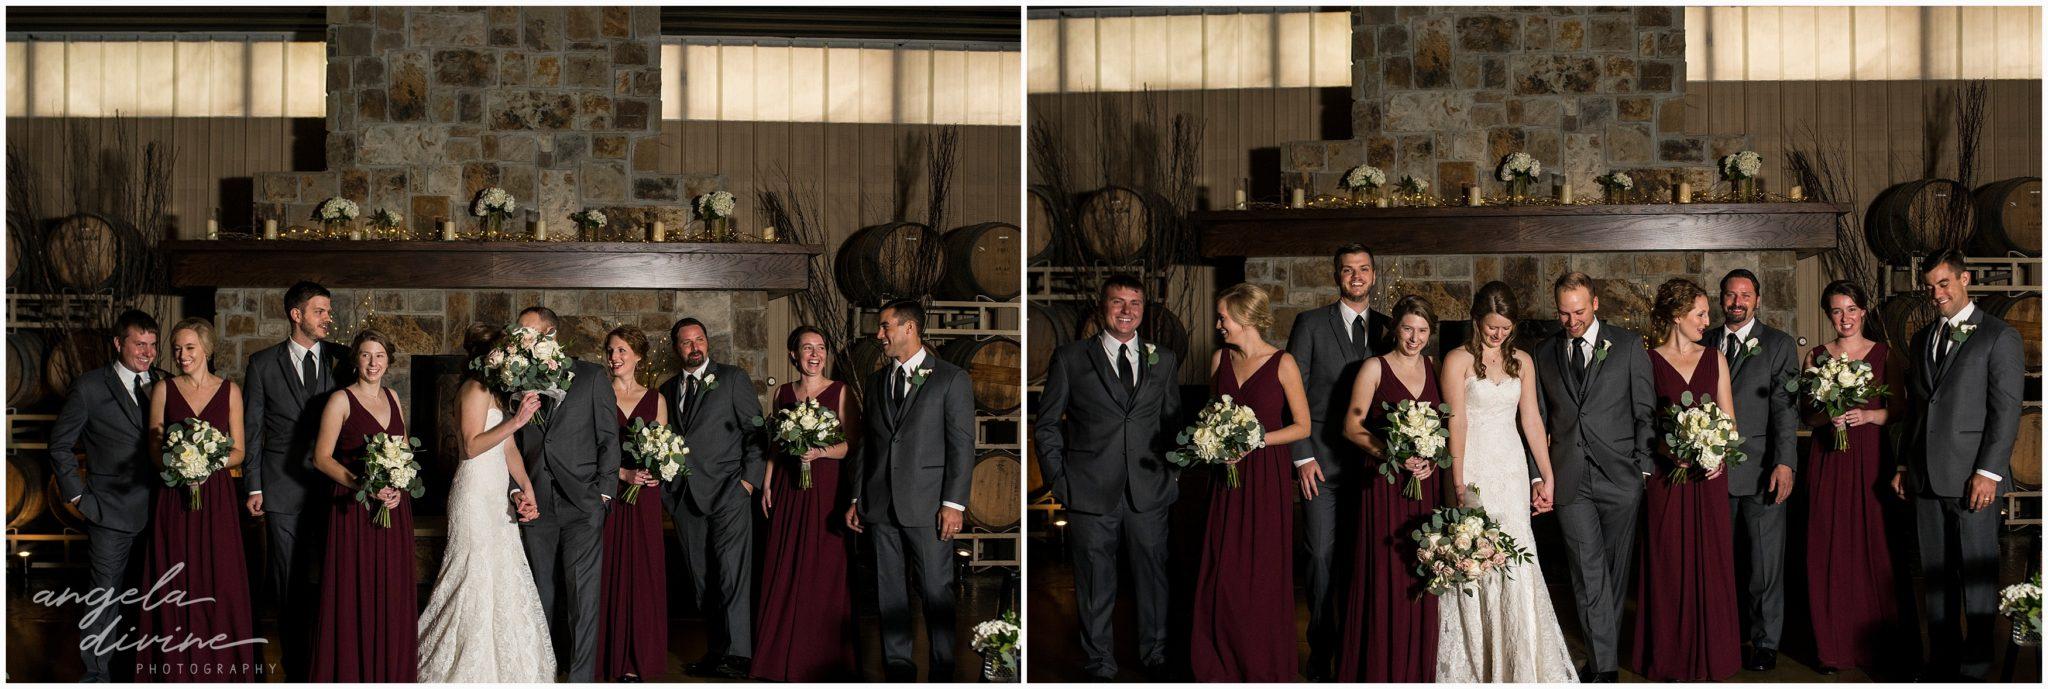 Carlos Creek Winery Wedding bridal part